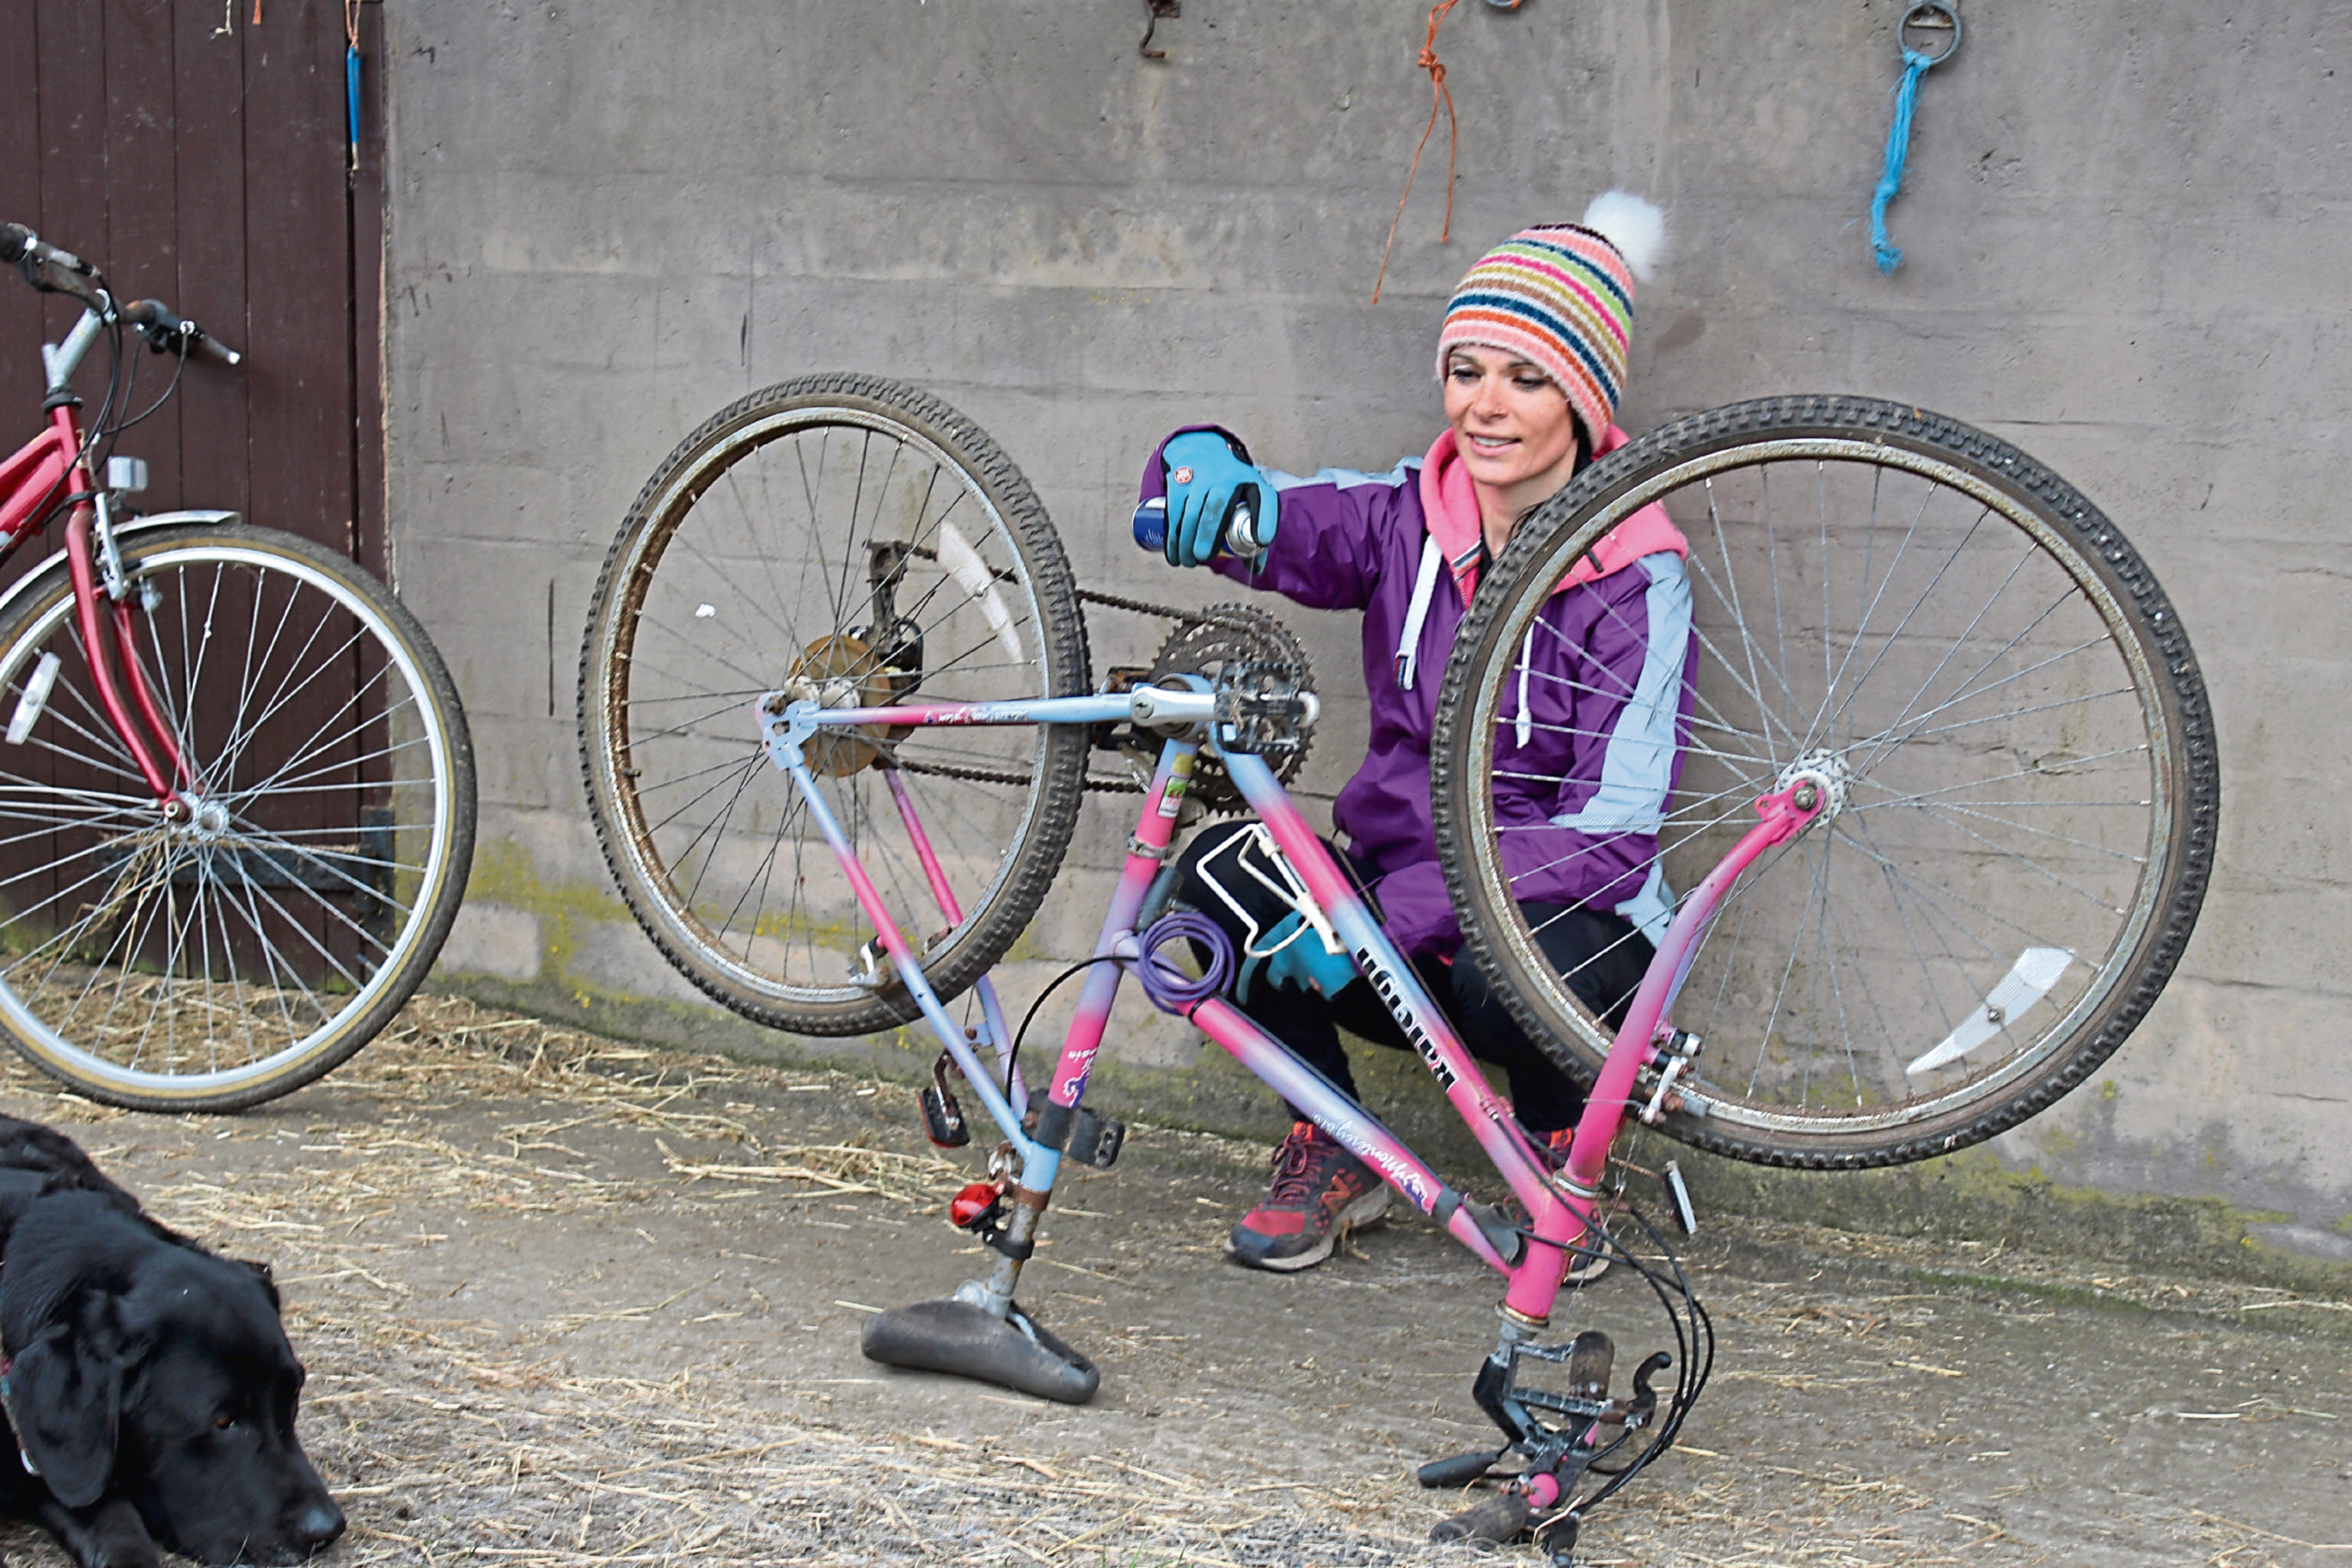 Gayle sprays some WD40 onto her very old bike.